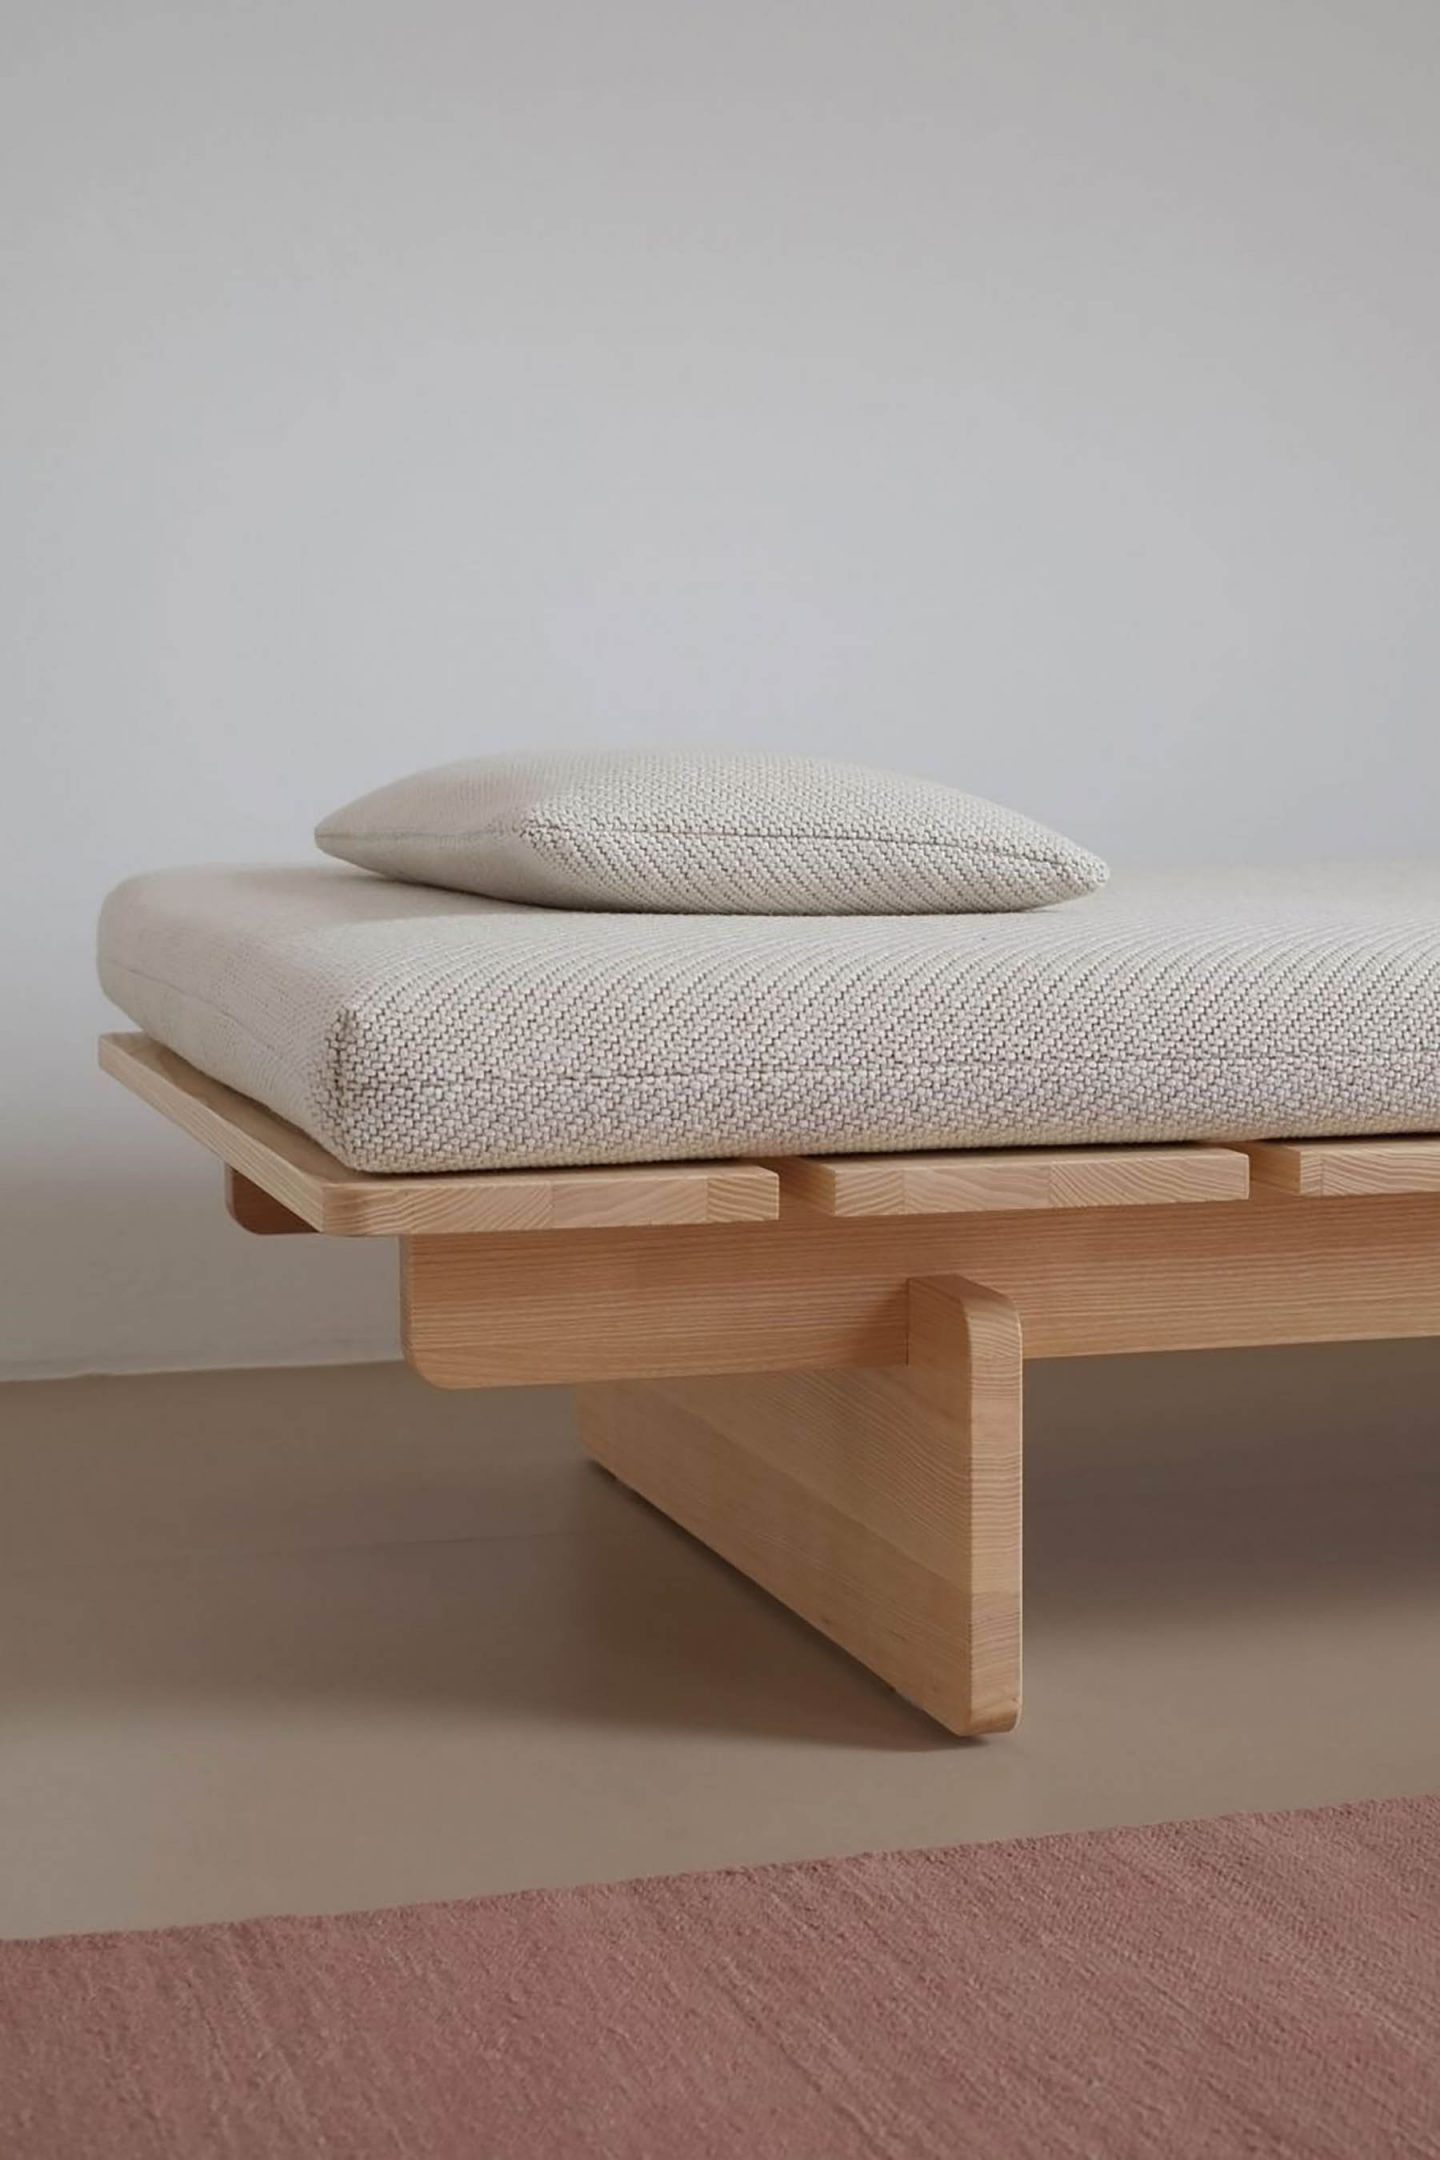 IGNANT-Design-Johannes-Fuchs-Barril-5